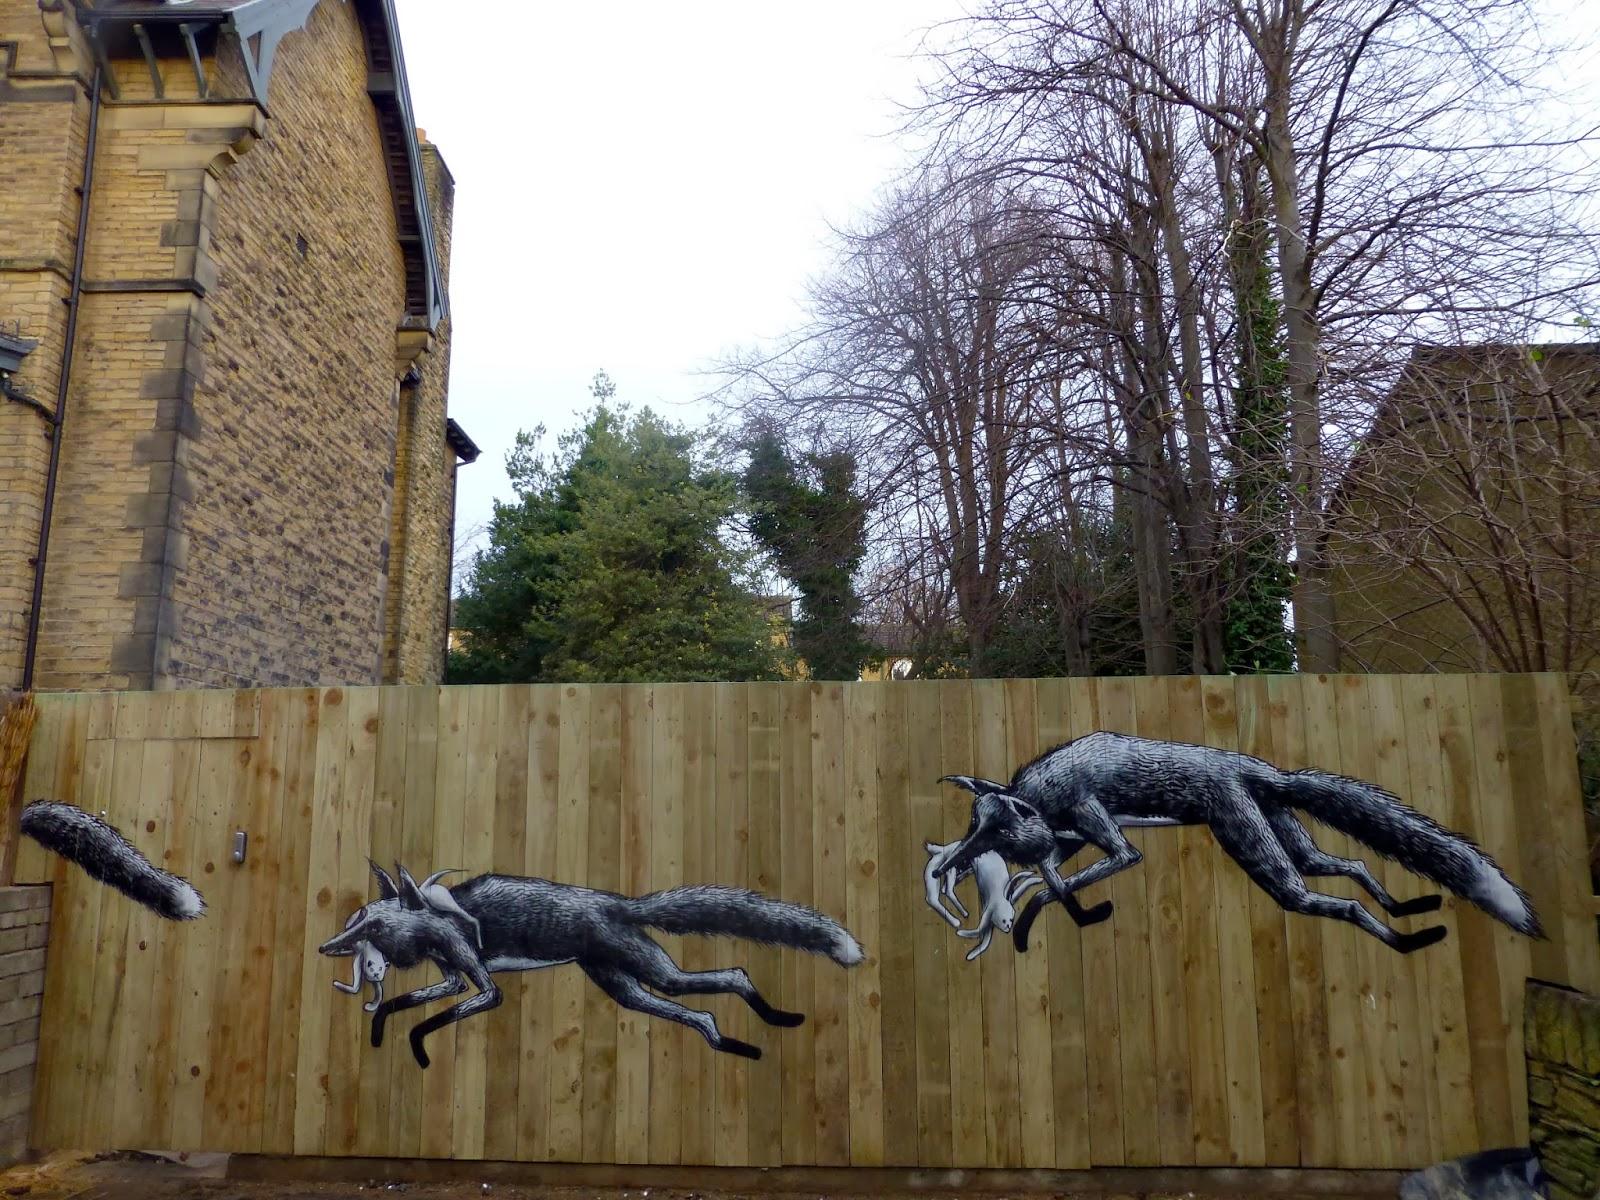 phlegm-urban-foxes-new-mural-sheffield-01